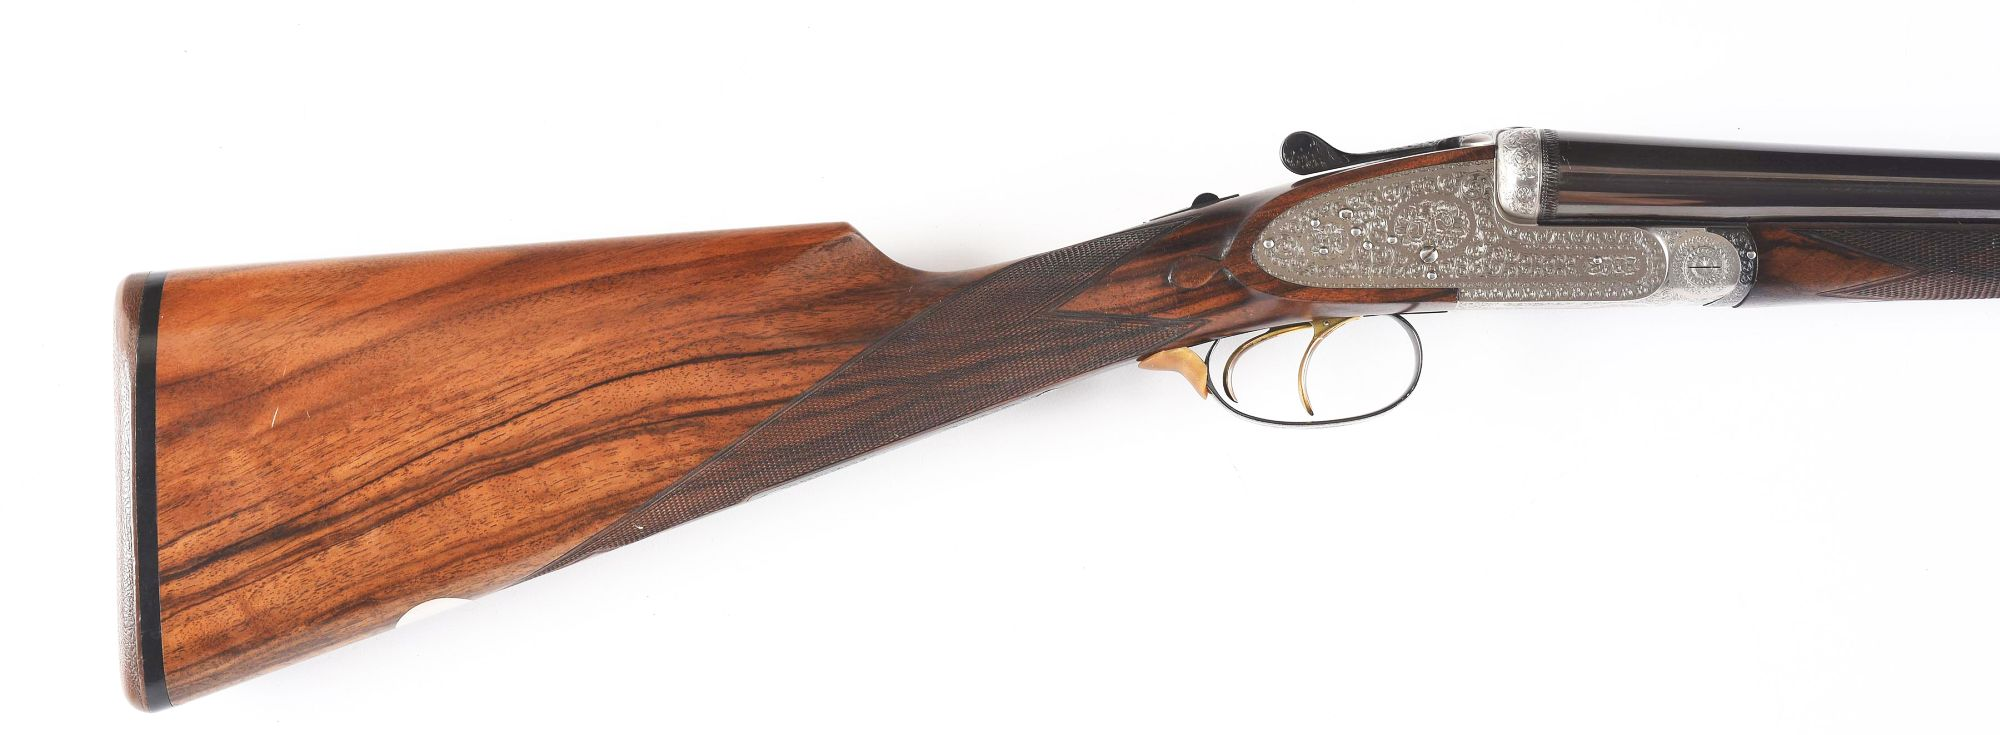 M) B C  Miroku Sidelock Ejector Shotgun with Extra Barrels